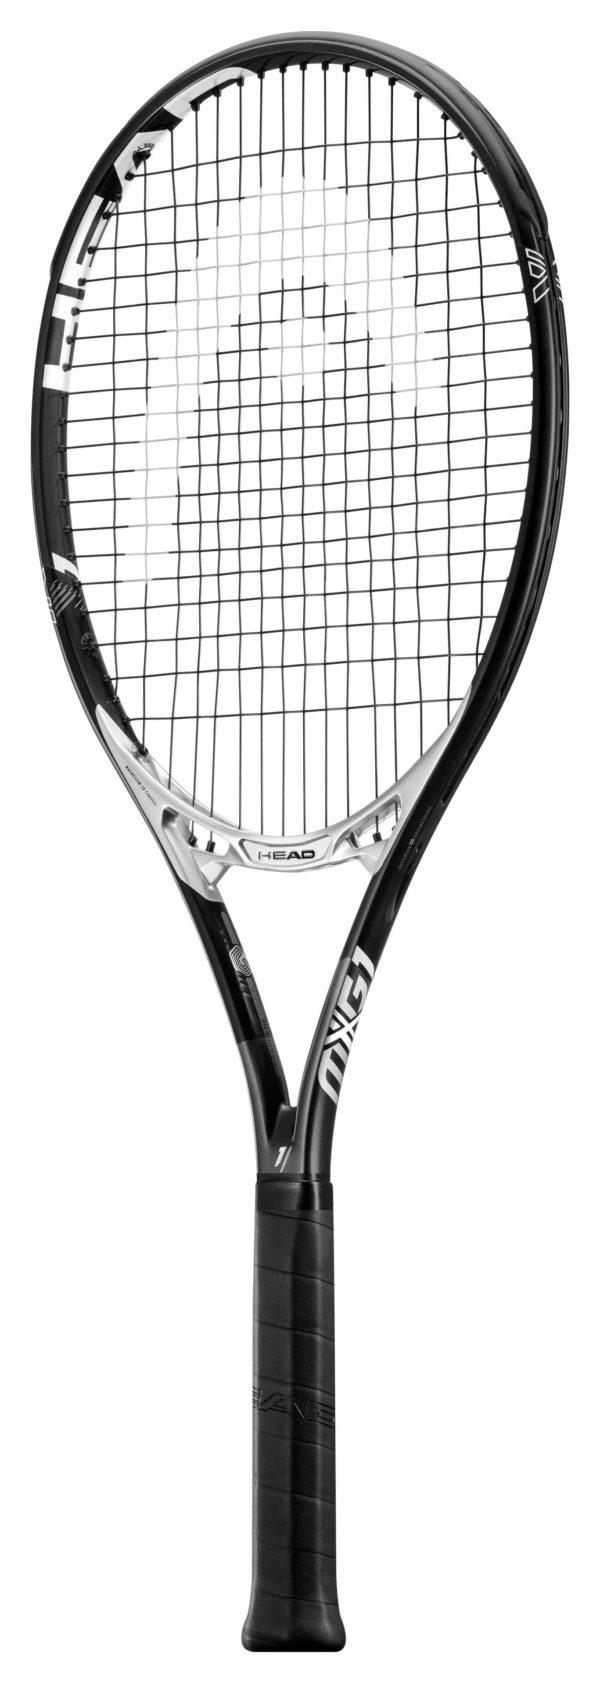 rakieta-tenisowa-head-238008_MXG_1_IMG_0021